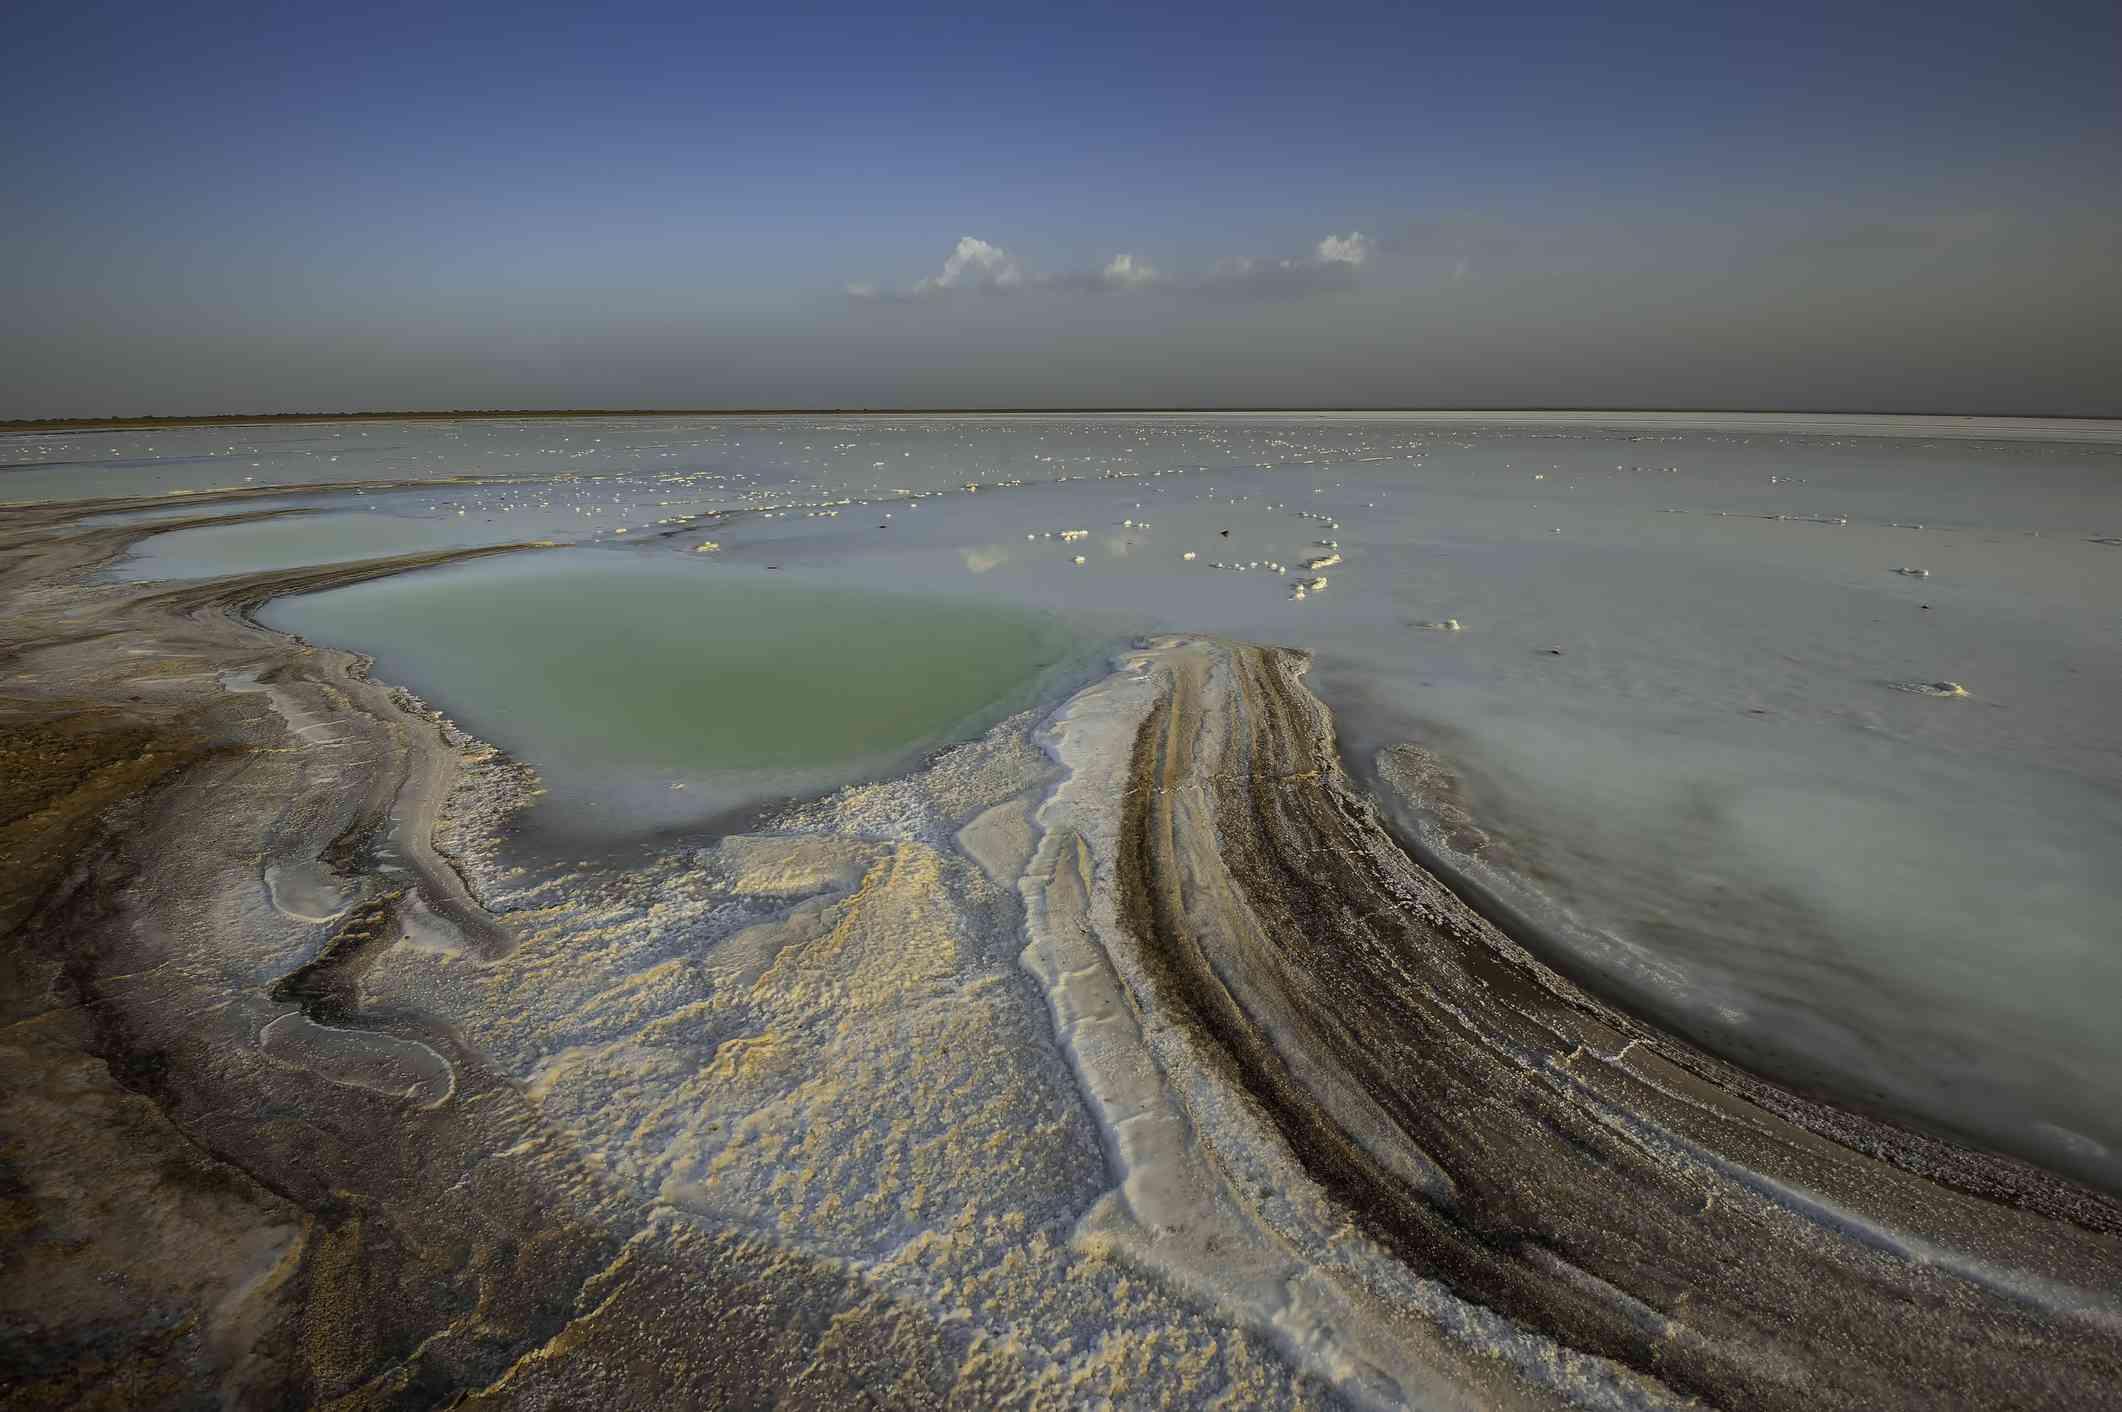 View of Great Rann of Kutch salt desert.